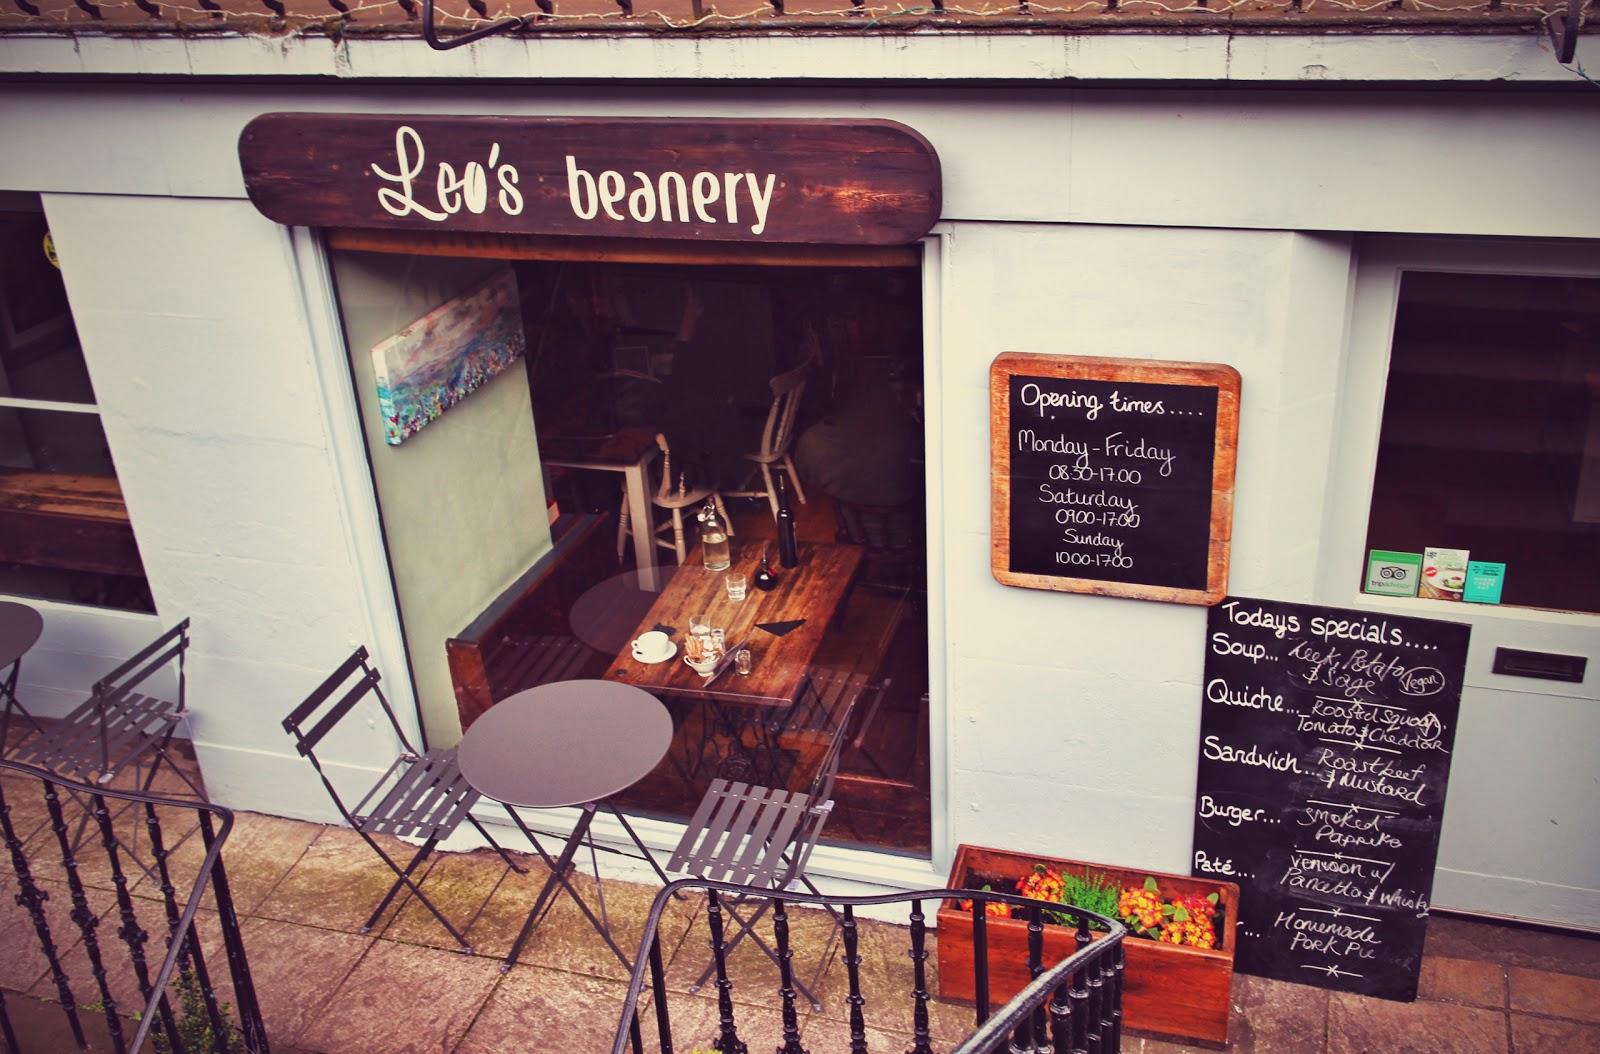 Leo's Beanery